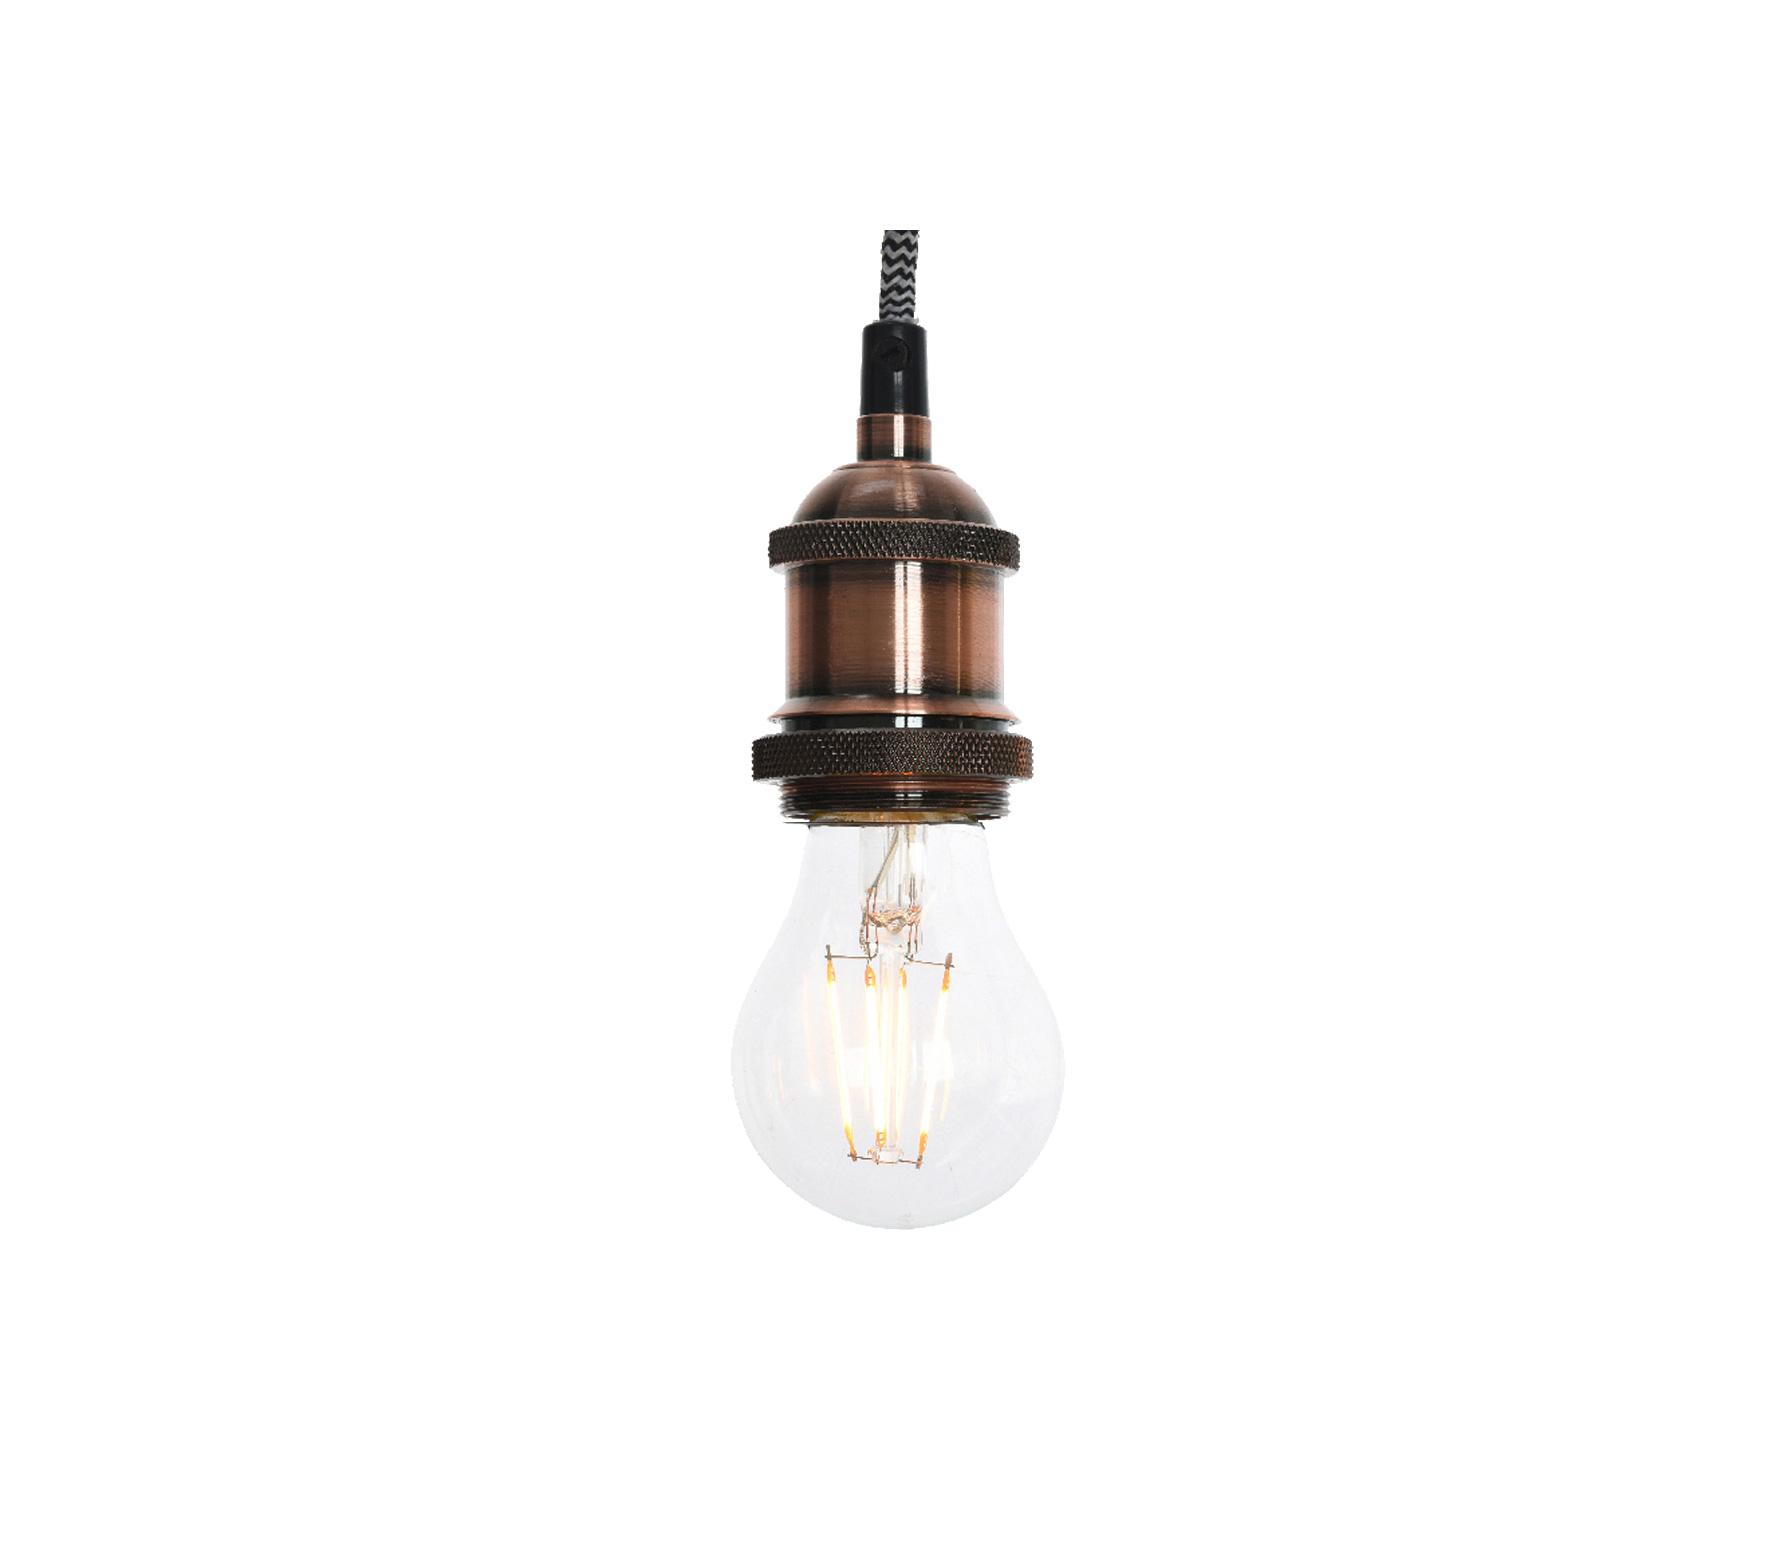 Hanglamp koperkleurig exclusief lamp metaal